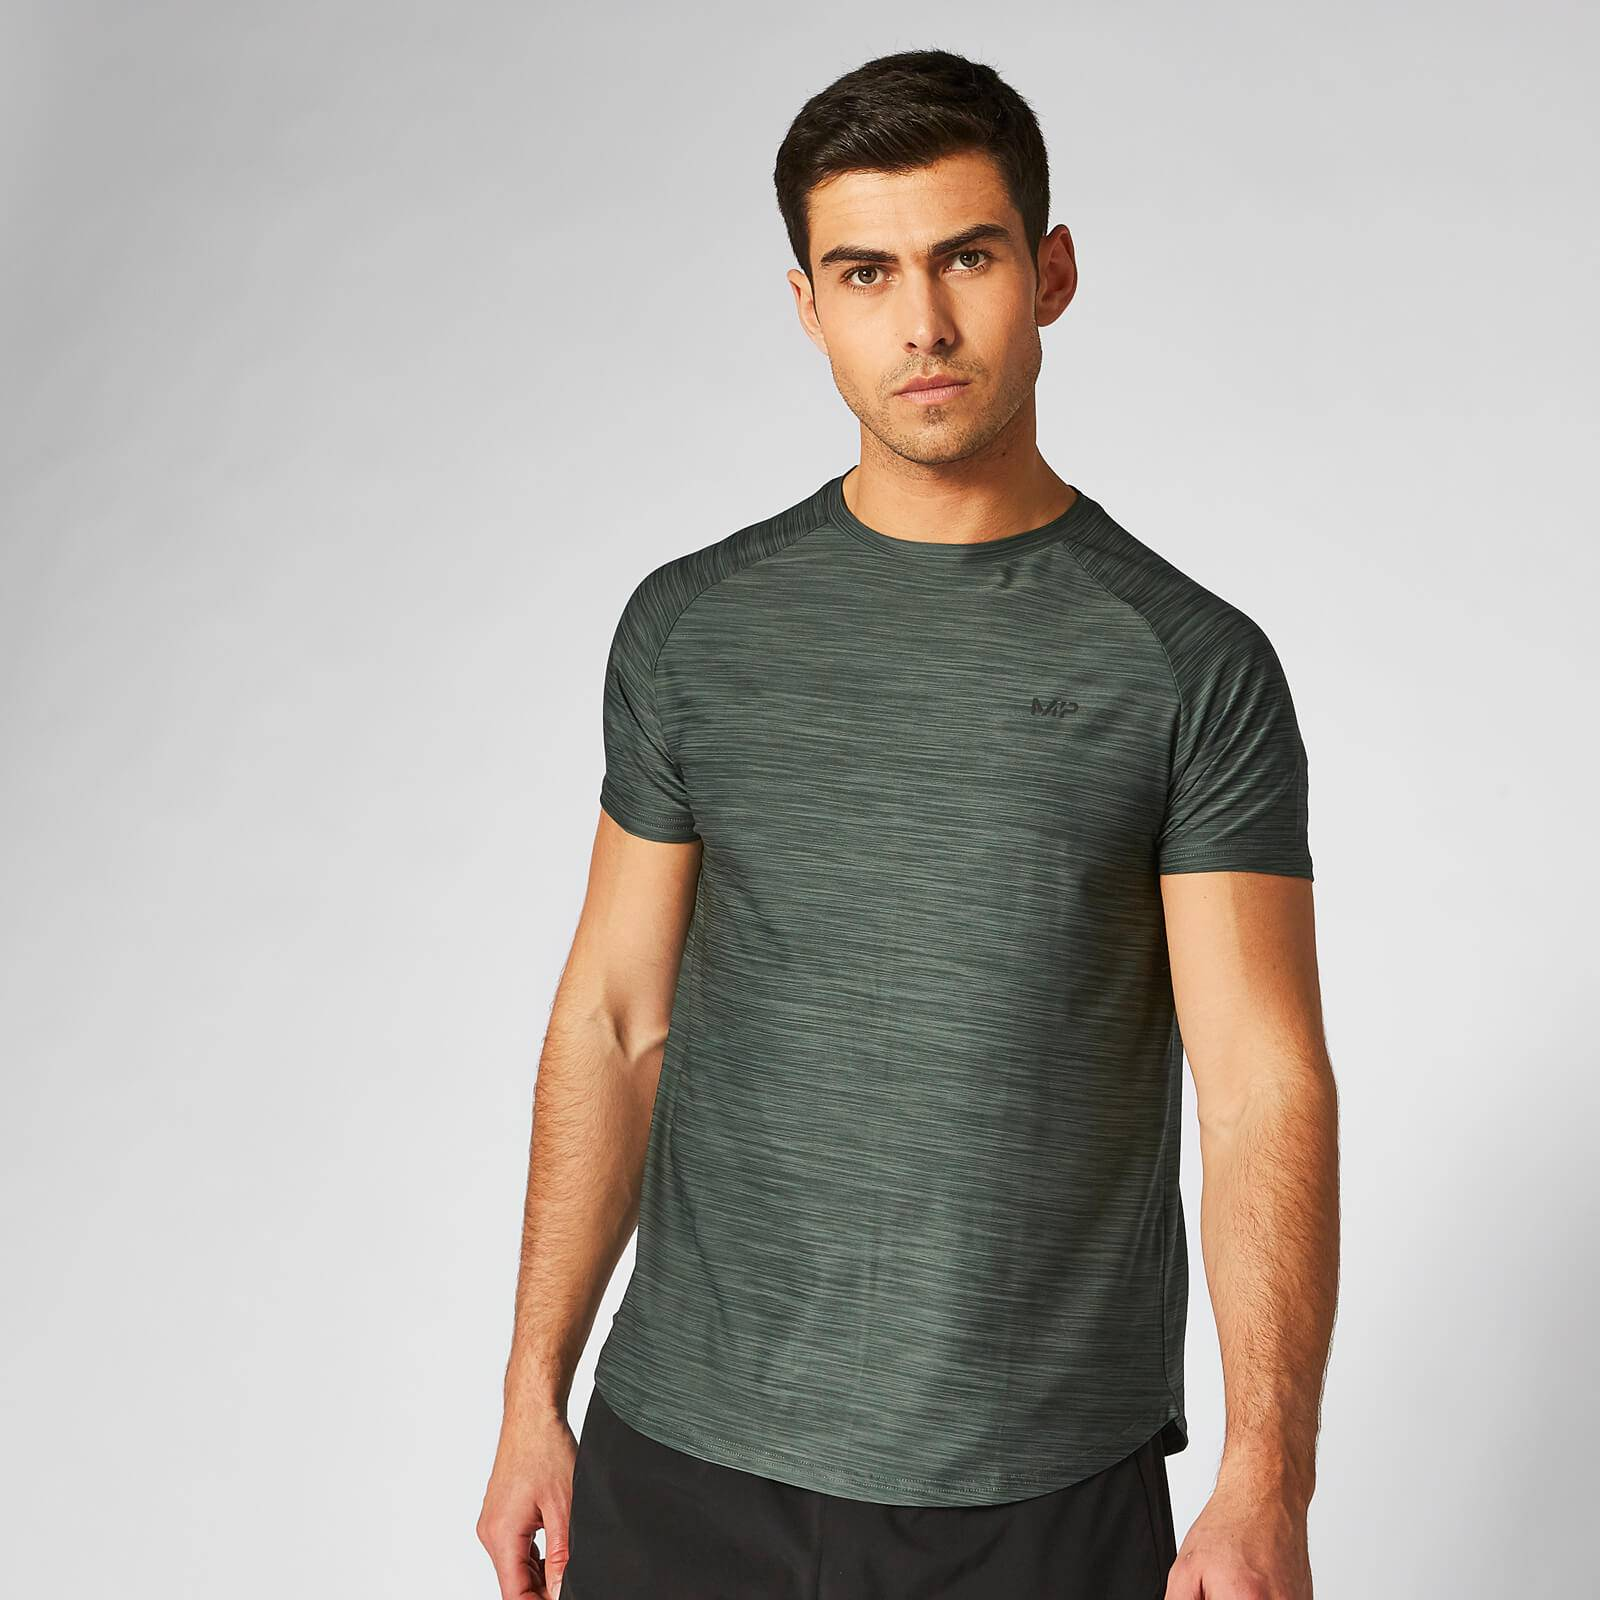 Myprotein Dry-Tech Infinity T-Shirt - Pine Marl - S